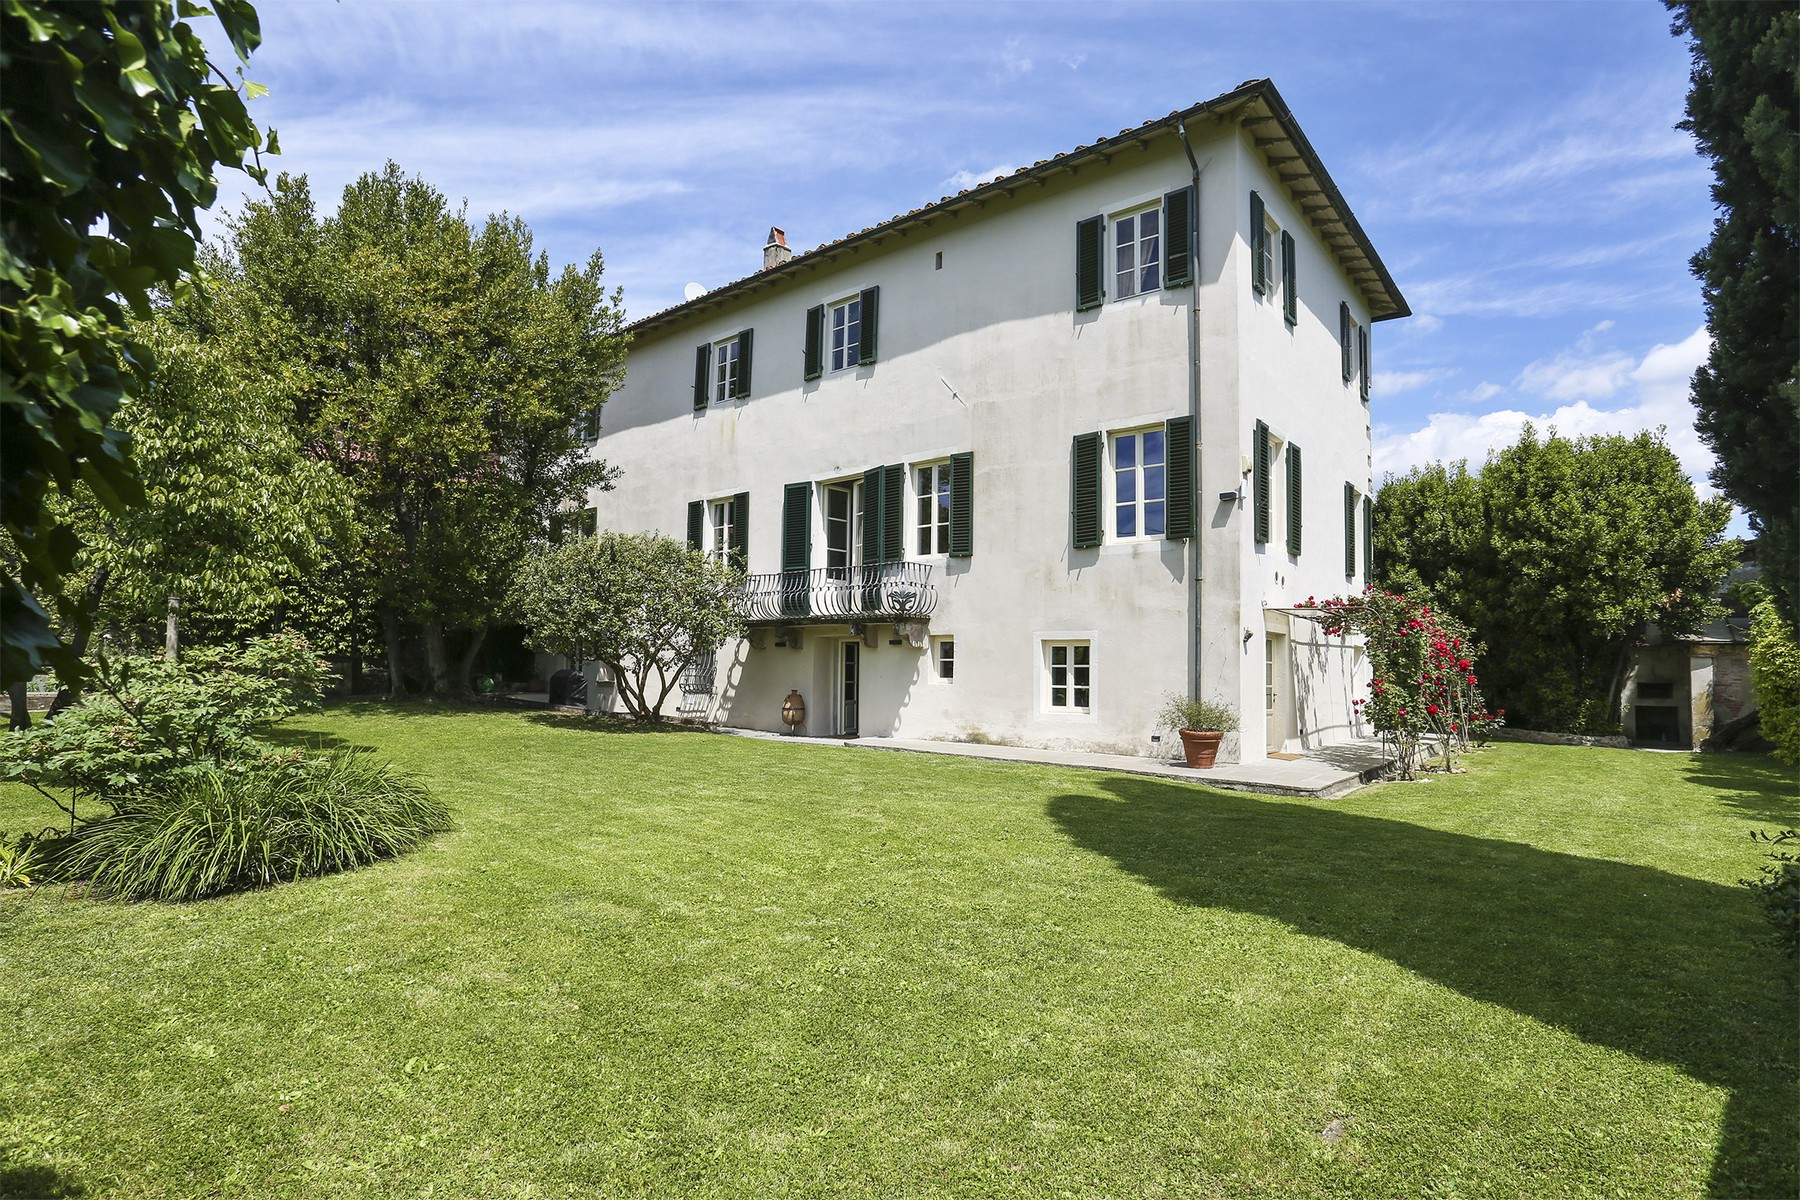 Villa in Vendita a Lucca: 5 locali, 735 mq - Foto 4